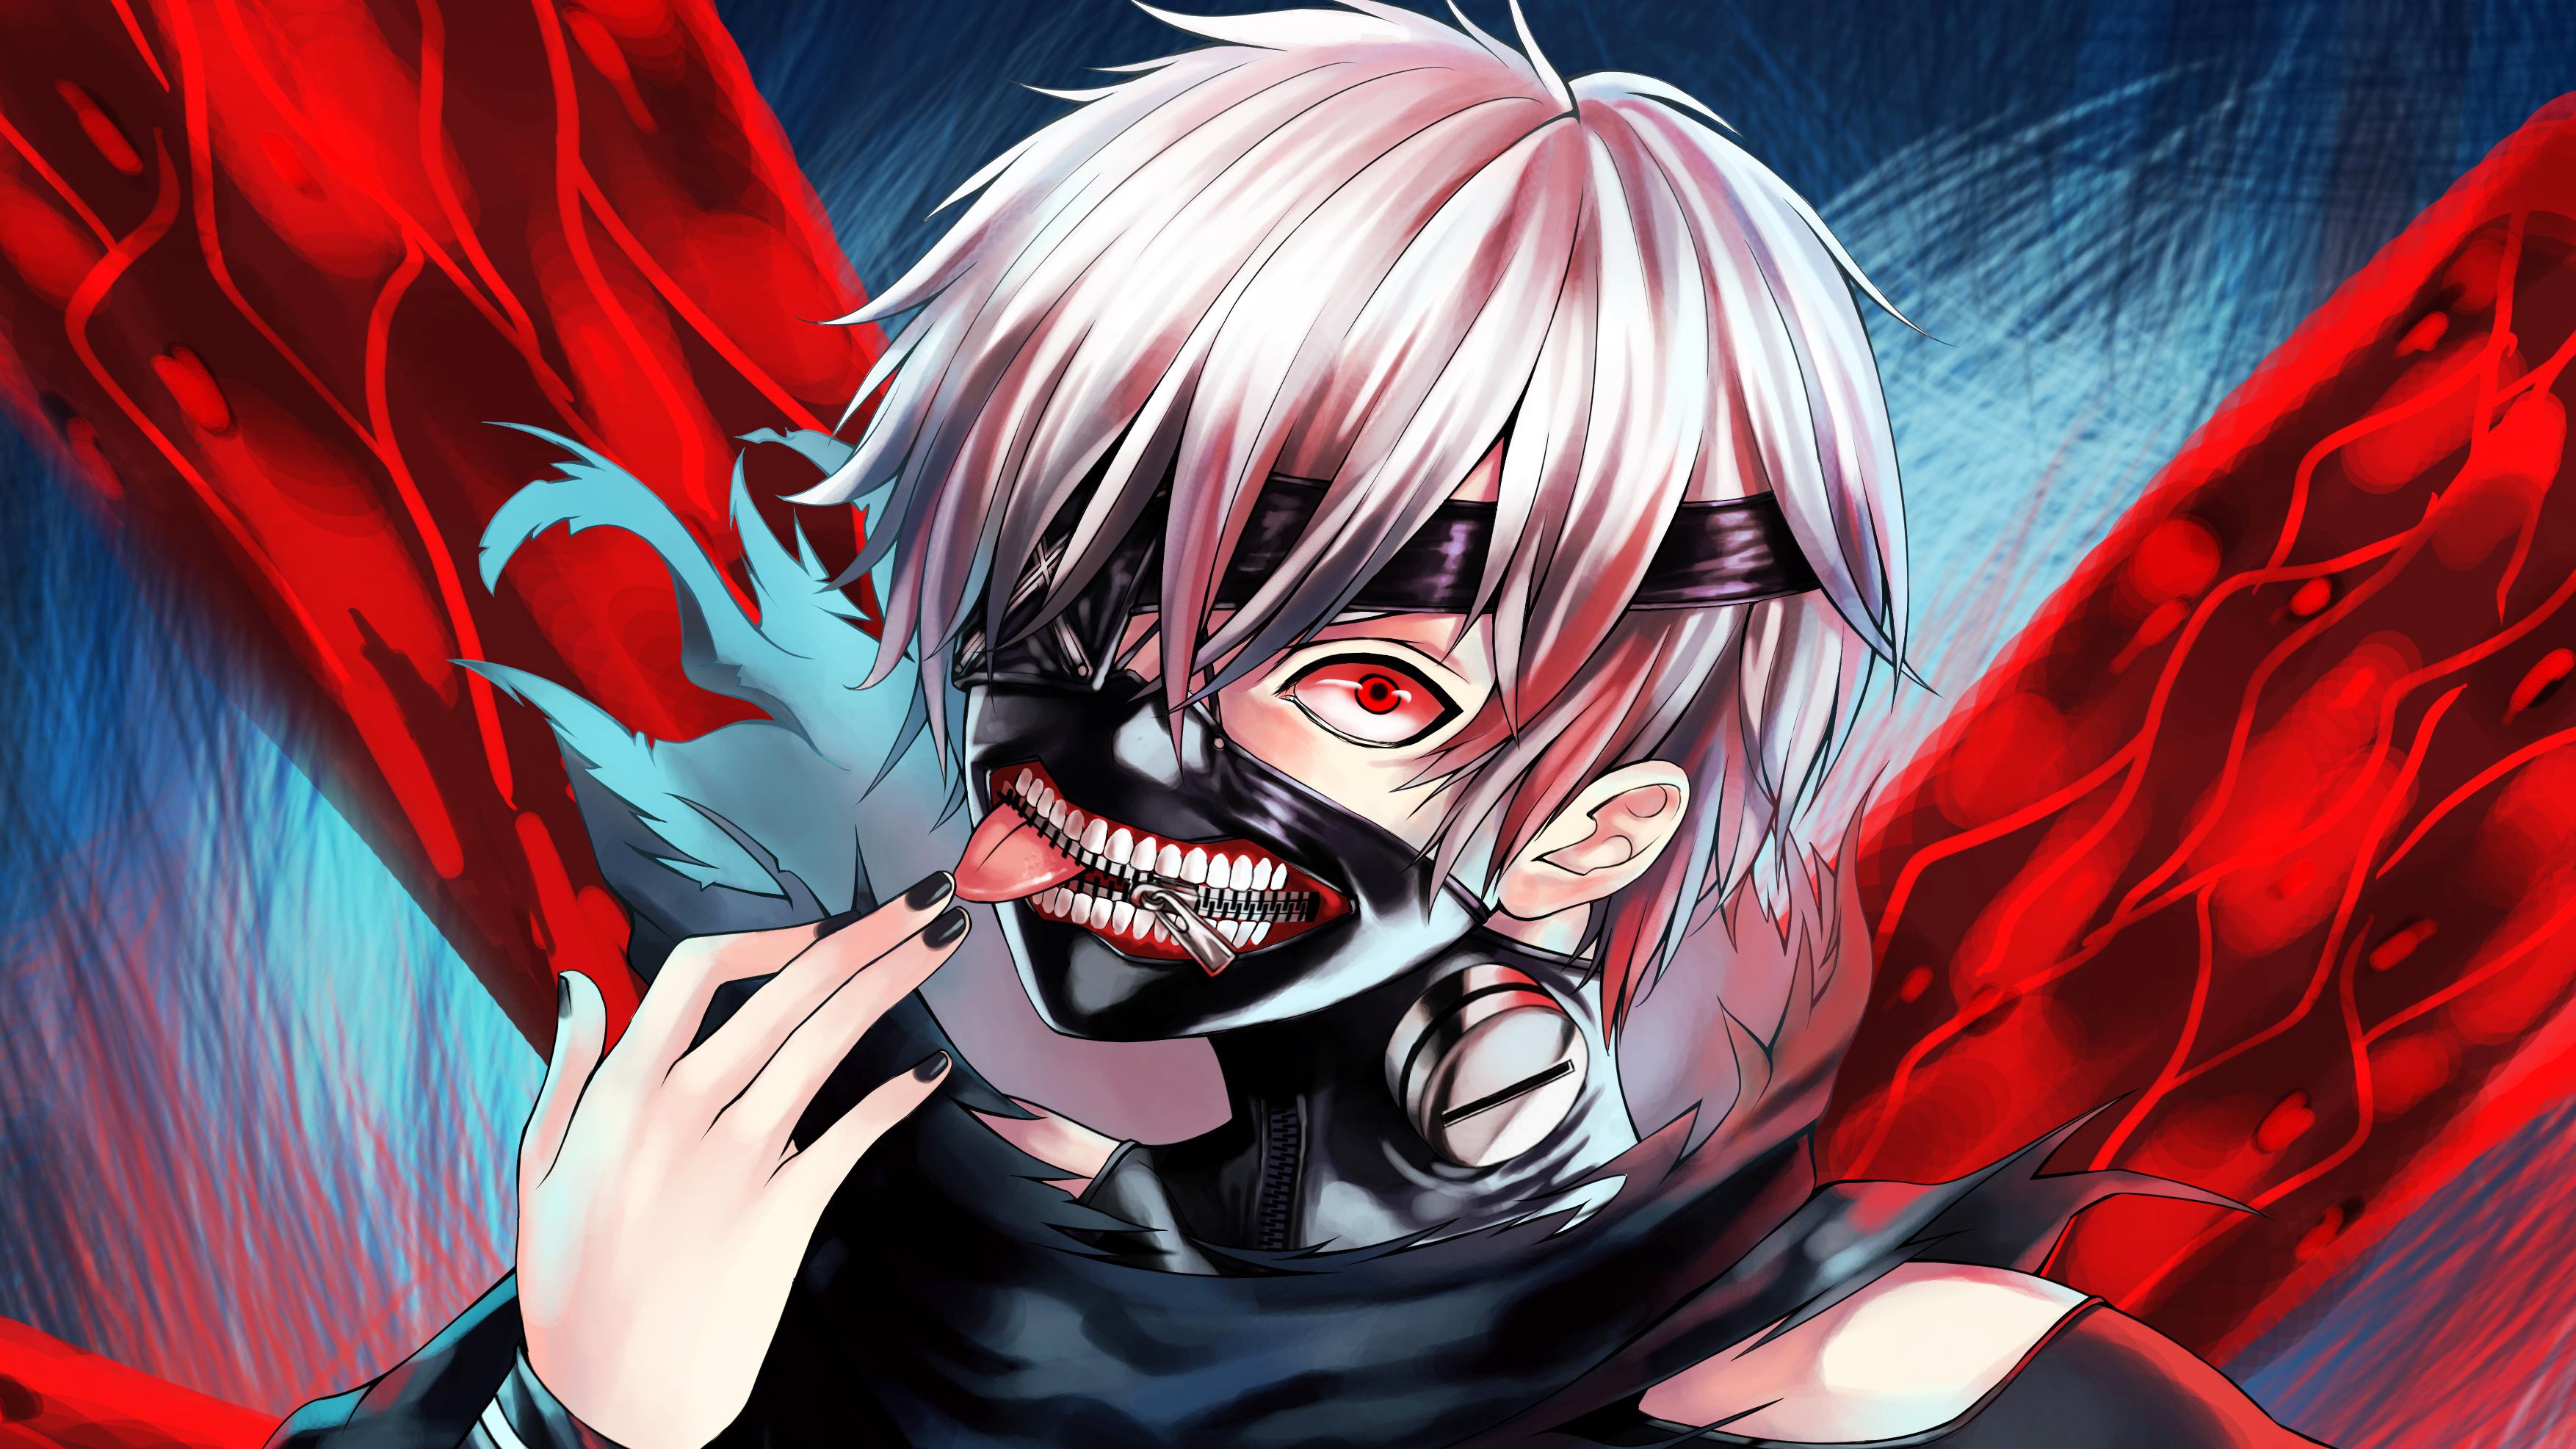 Iphone wallpaper app, galaxy wallpaper, wallpaper app, dark aesthetic, homescreen, icon. Tokyo Ghoul Anime 4k, HD Anime, 4k Wallpapers, Images ...